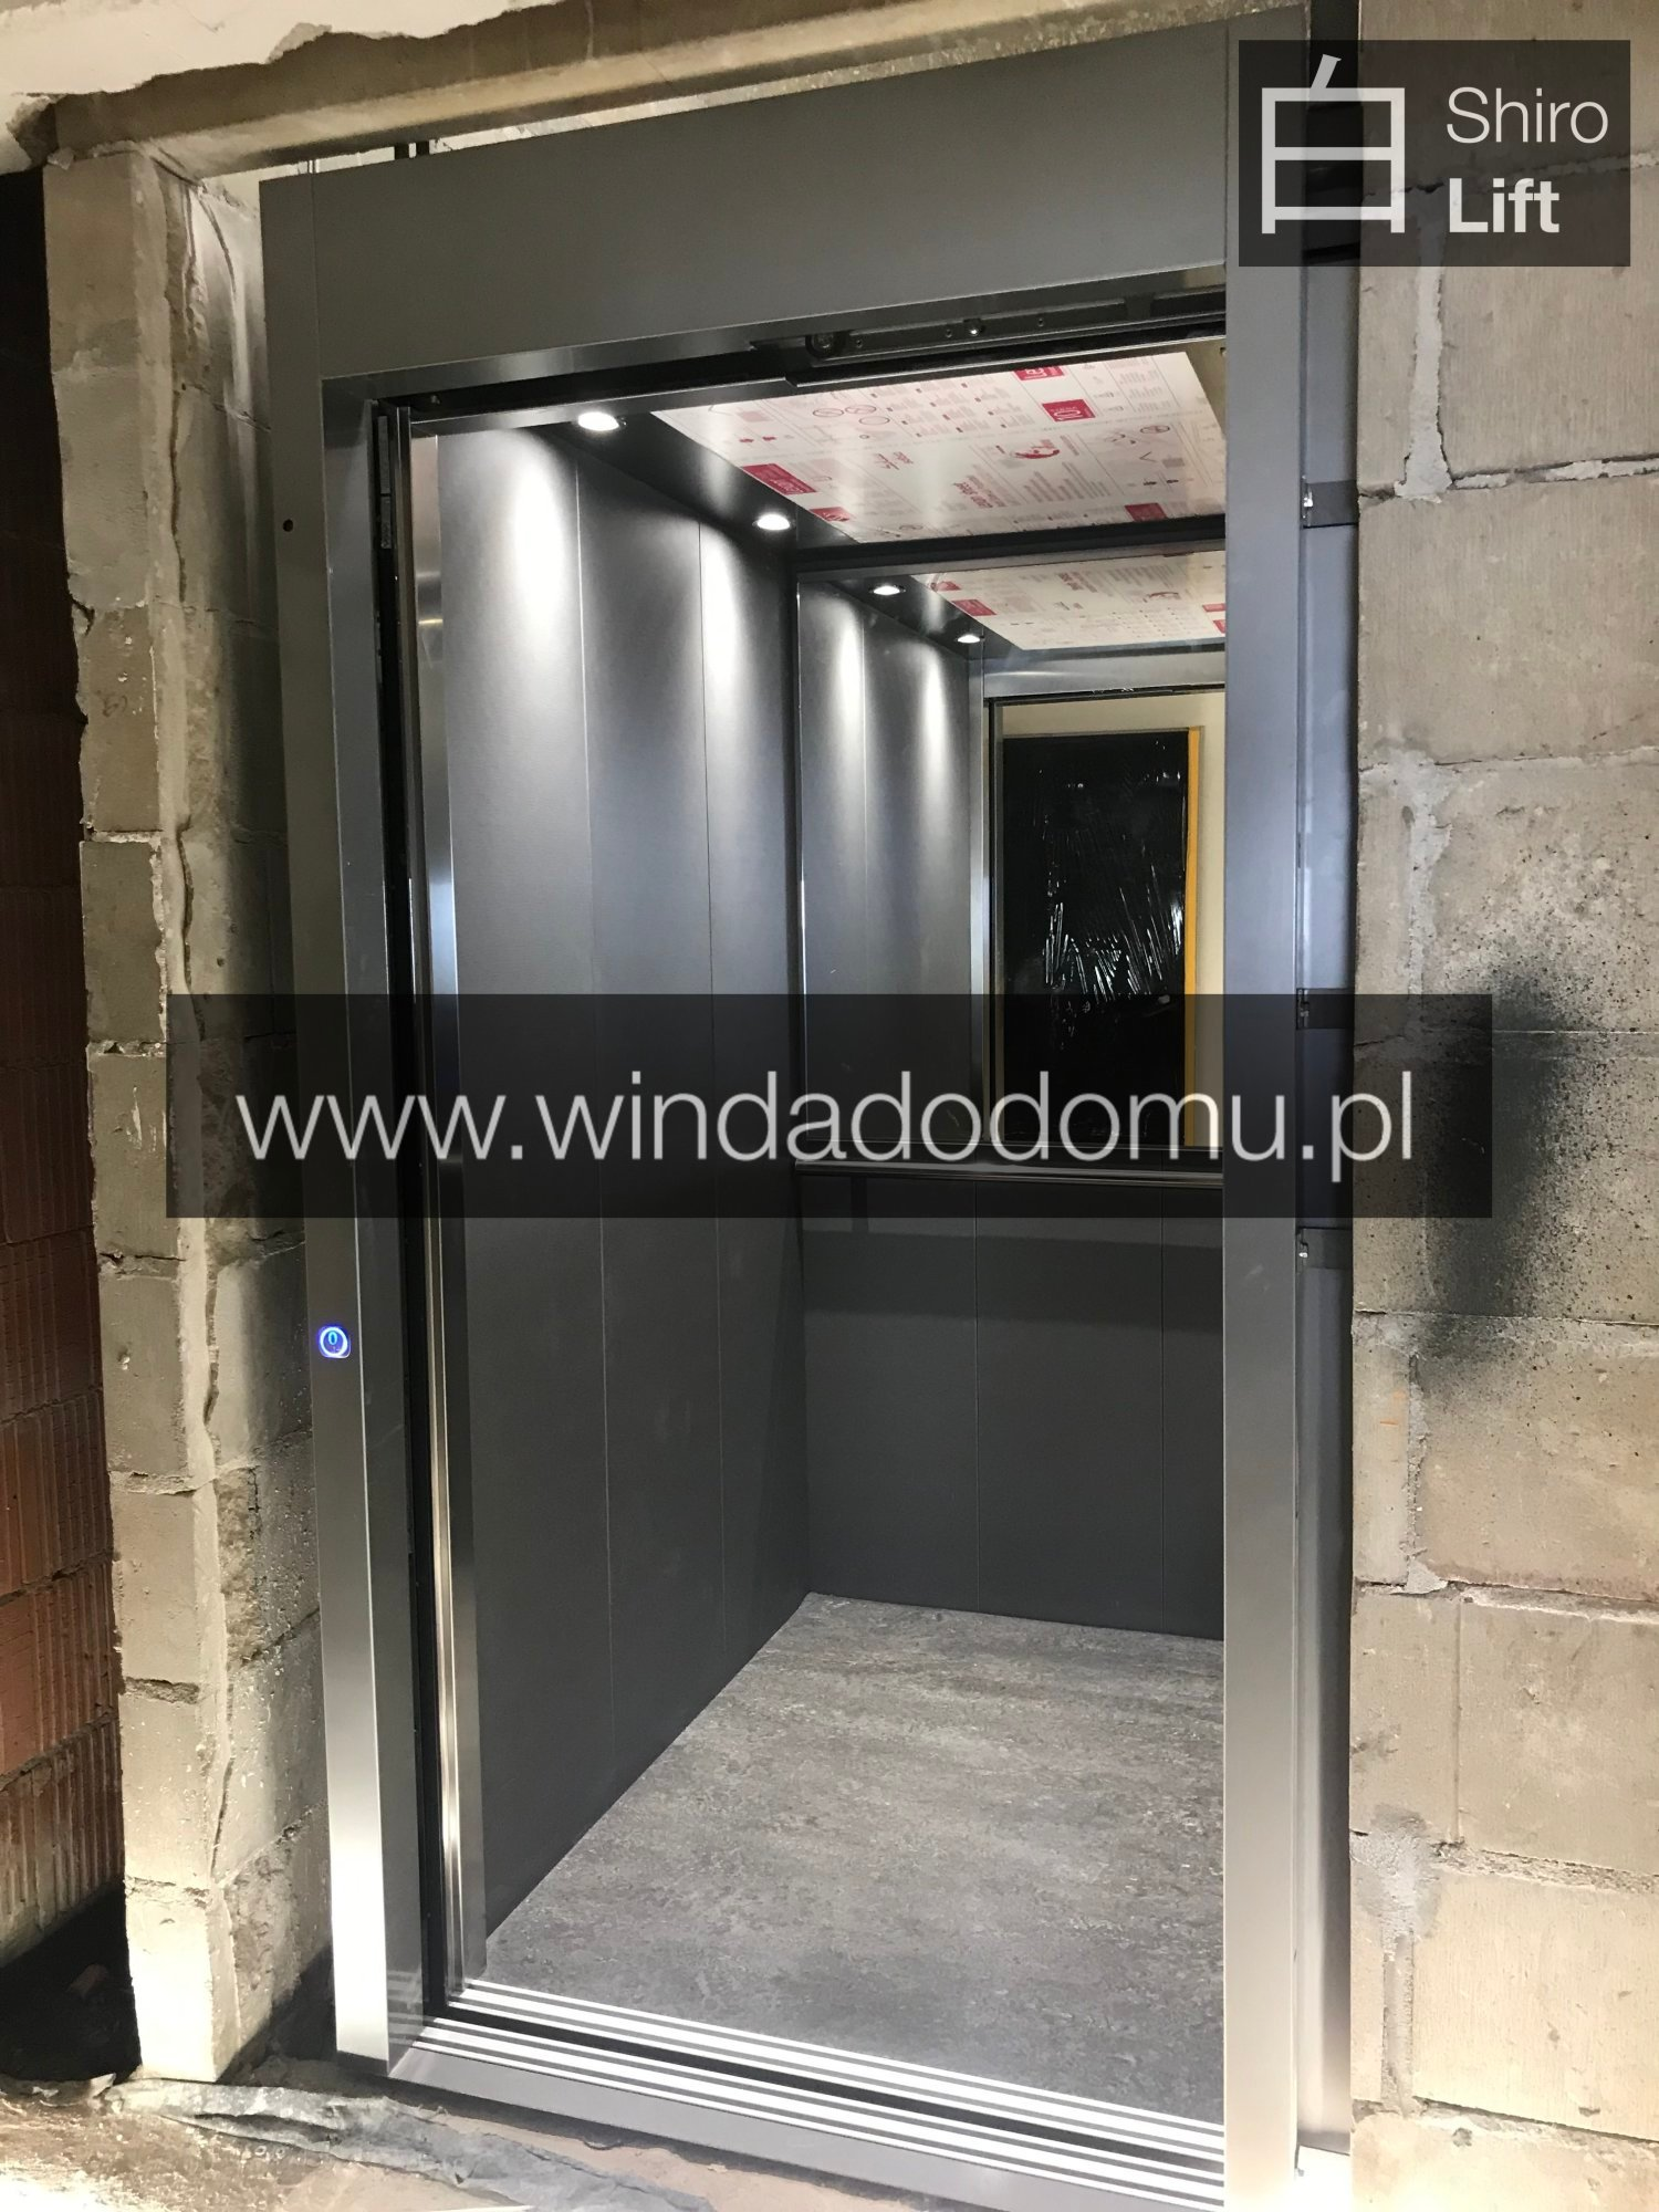 winda Indomo do domu prywatnego